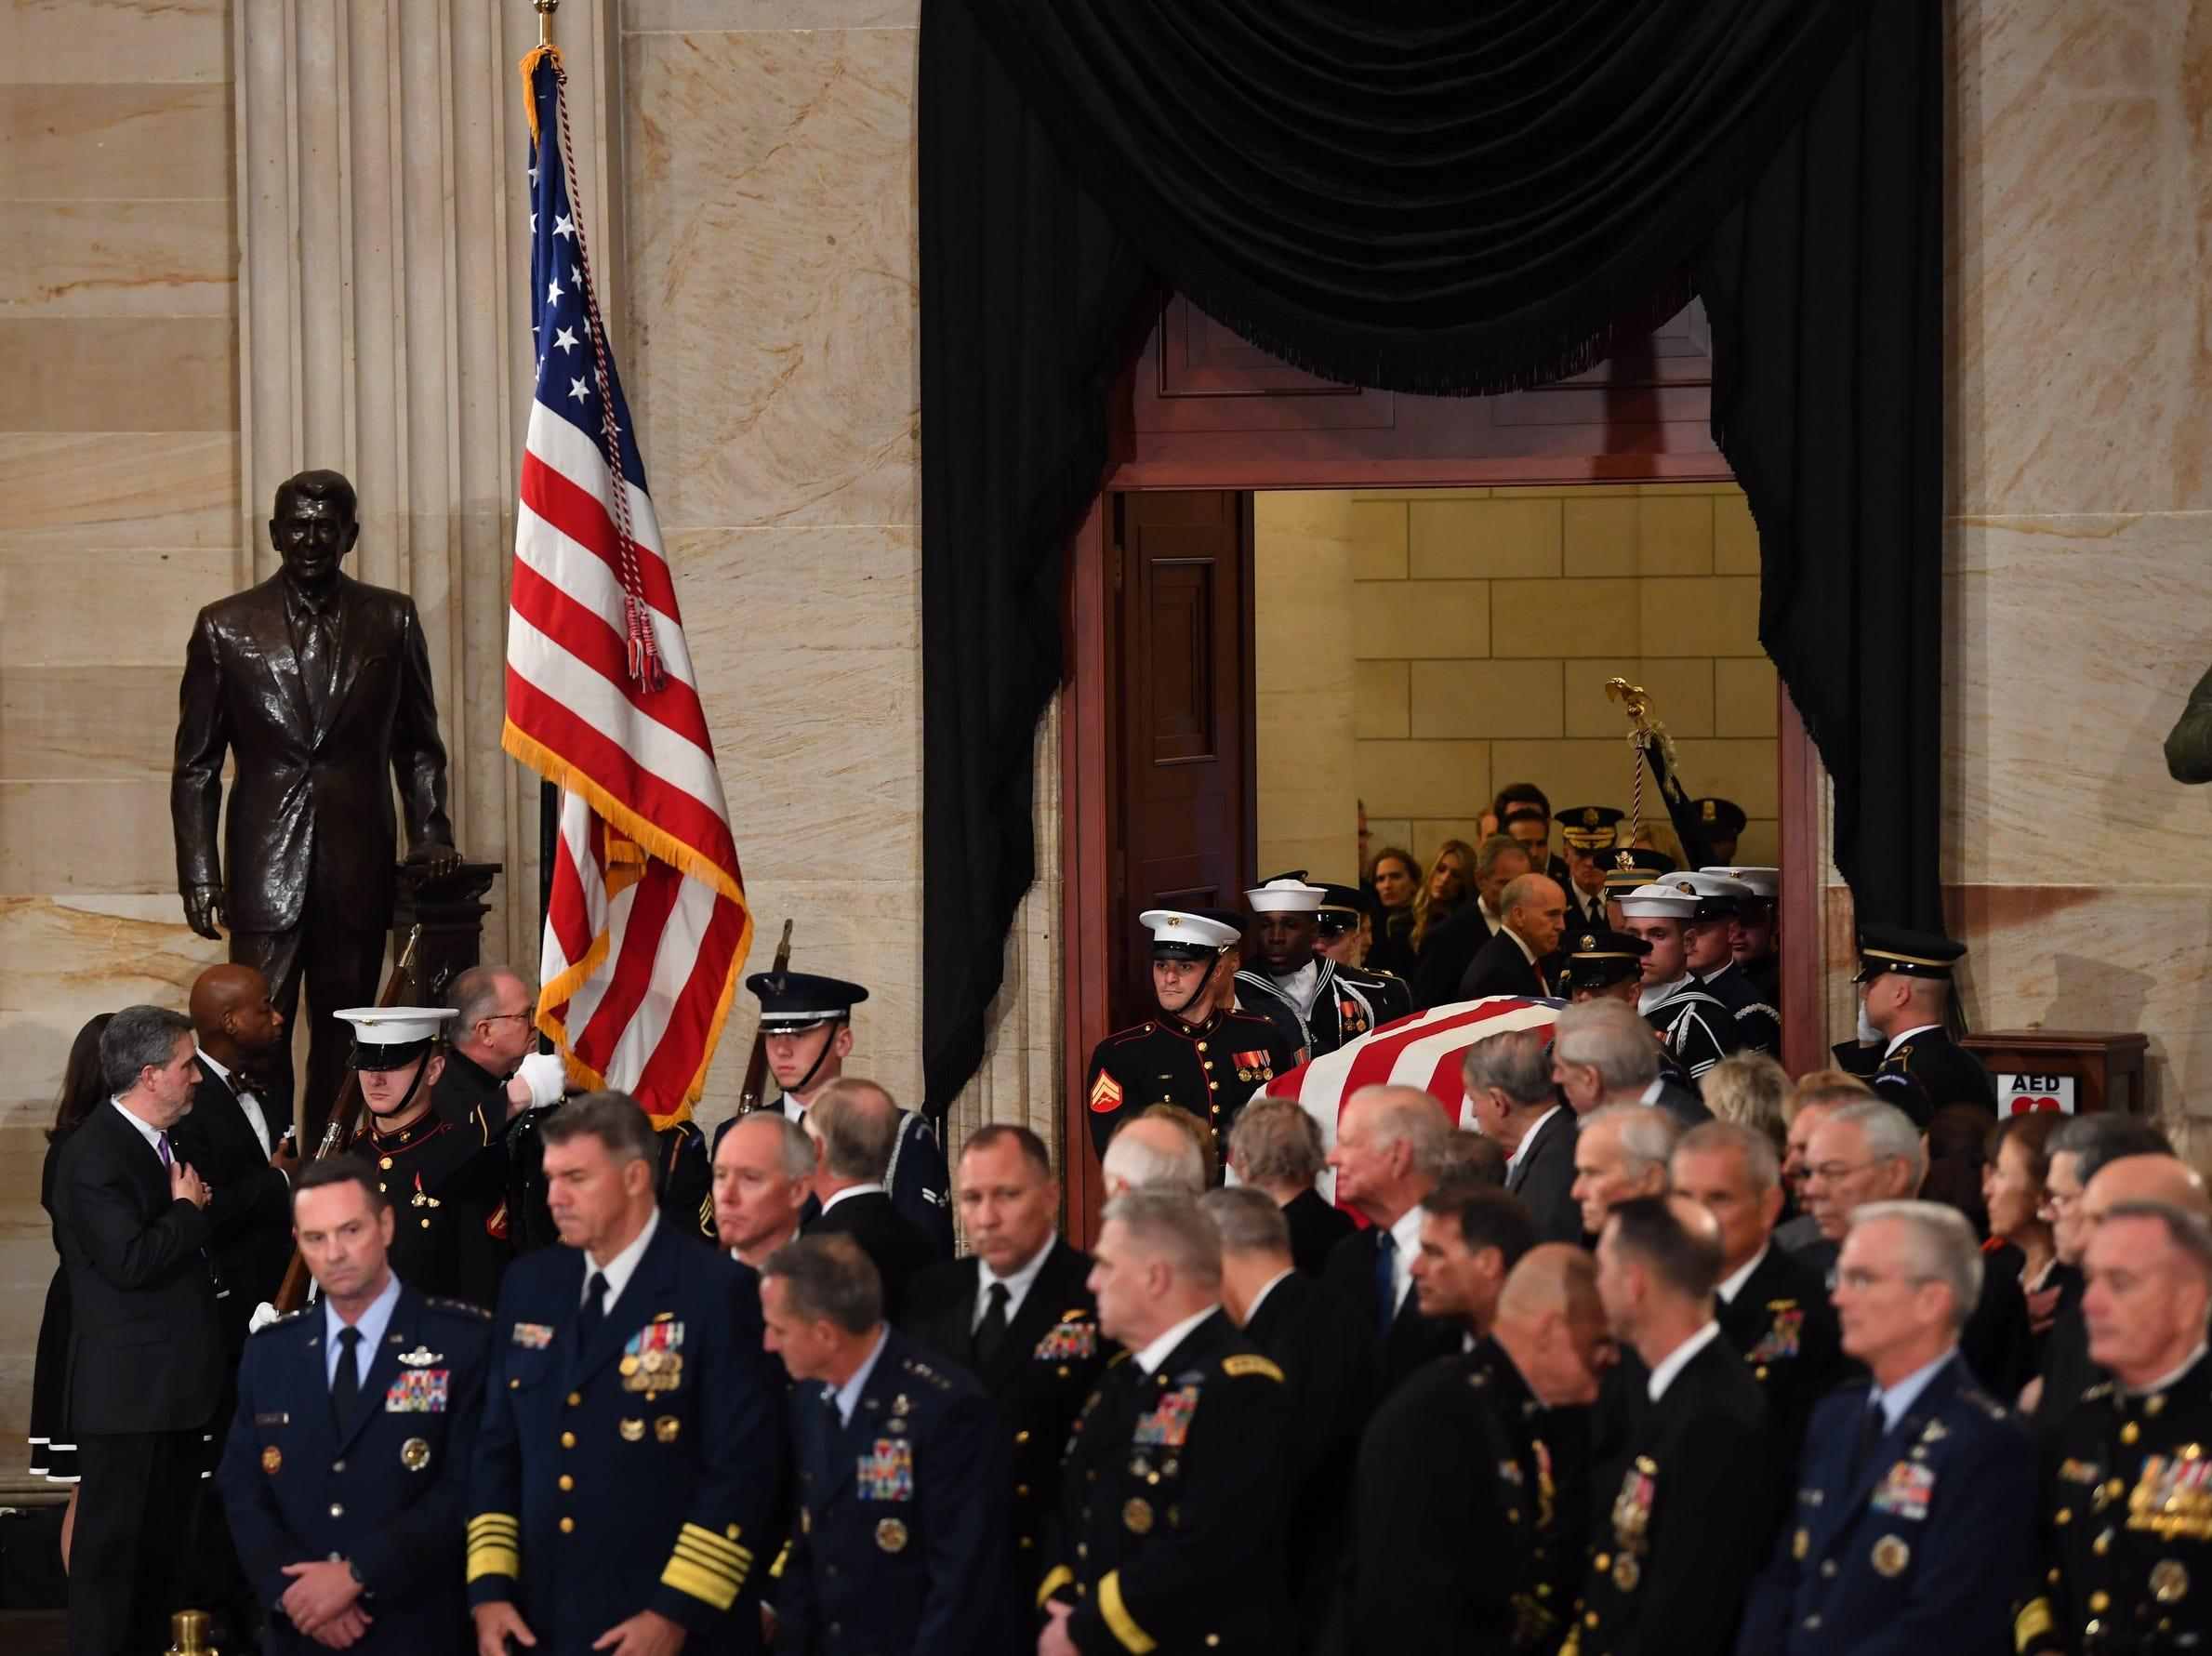 Honor guards bear the casket of former U.S President George H.W. Bush into the U.S. Capitol Rotunda.